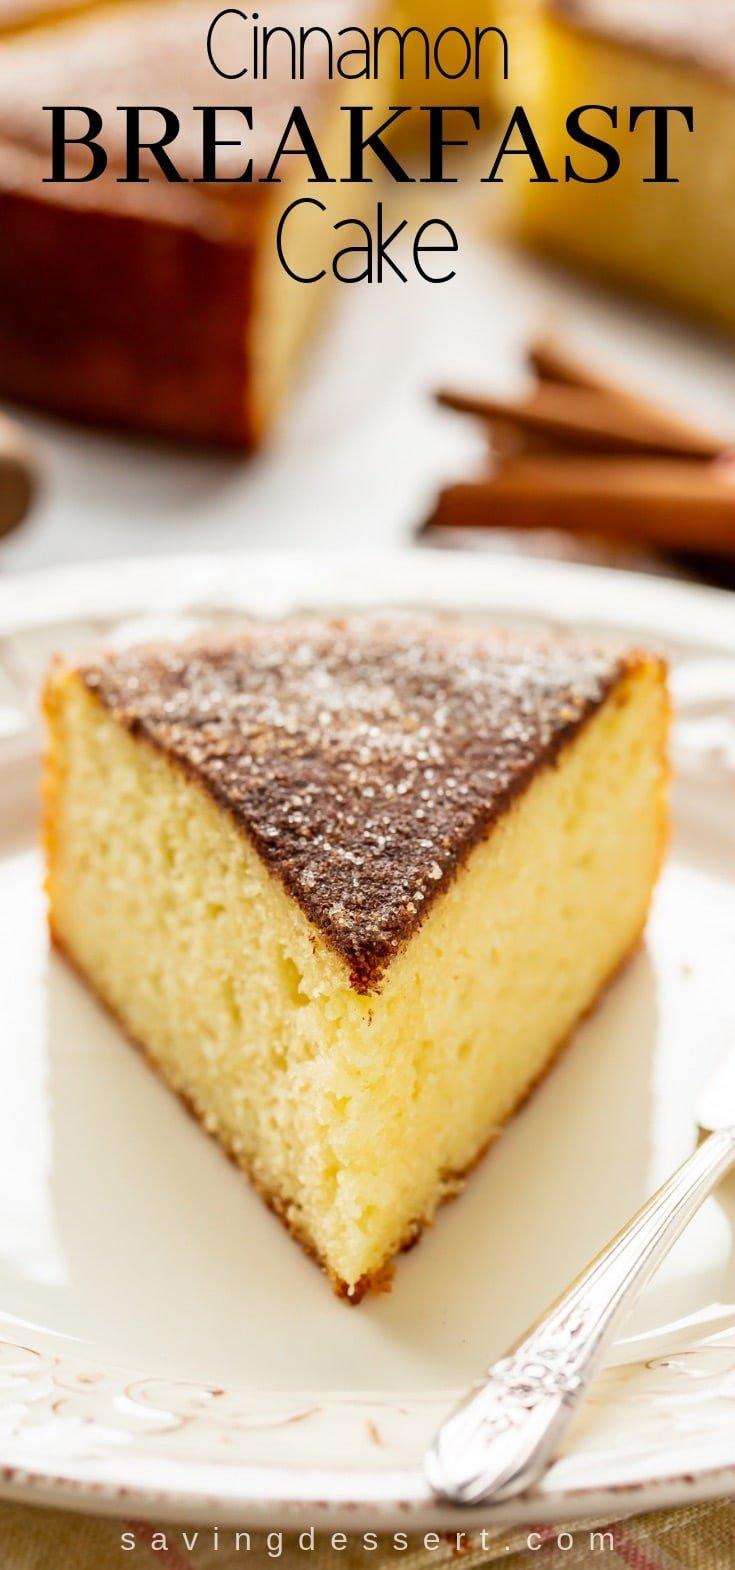 Cinnamon Breakfast Cake - tastes like a big, soft snickerdoodle! #cinnamoncake #cake #breakfastcake #coffeecake #brunch #cinnamonbreakfastcake #easycake #nomixercake #breakfast